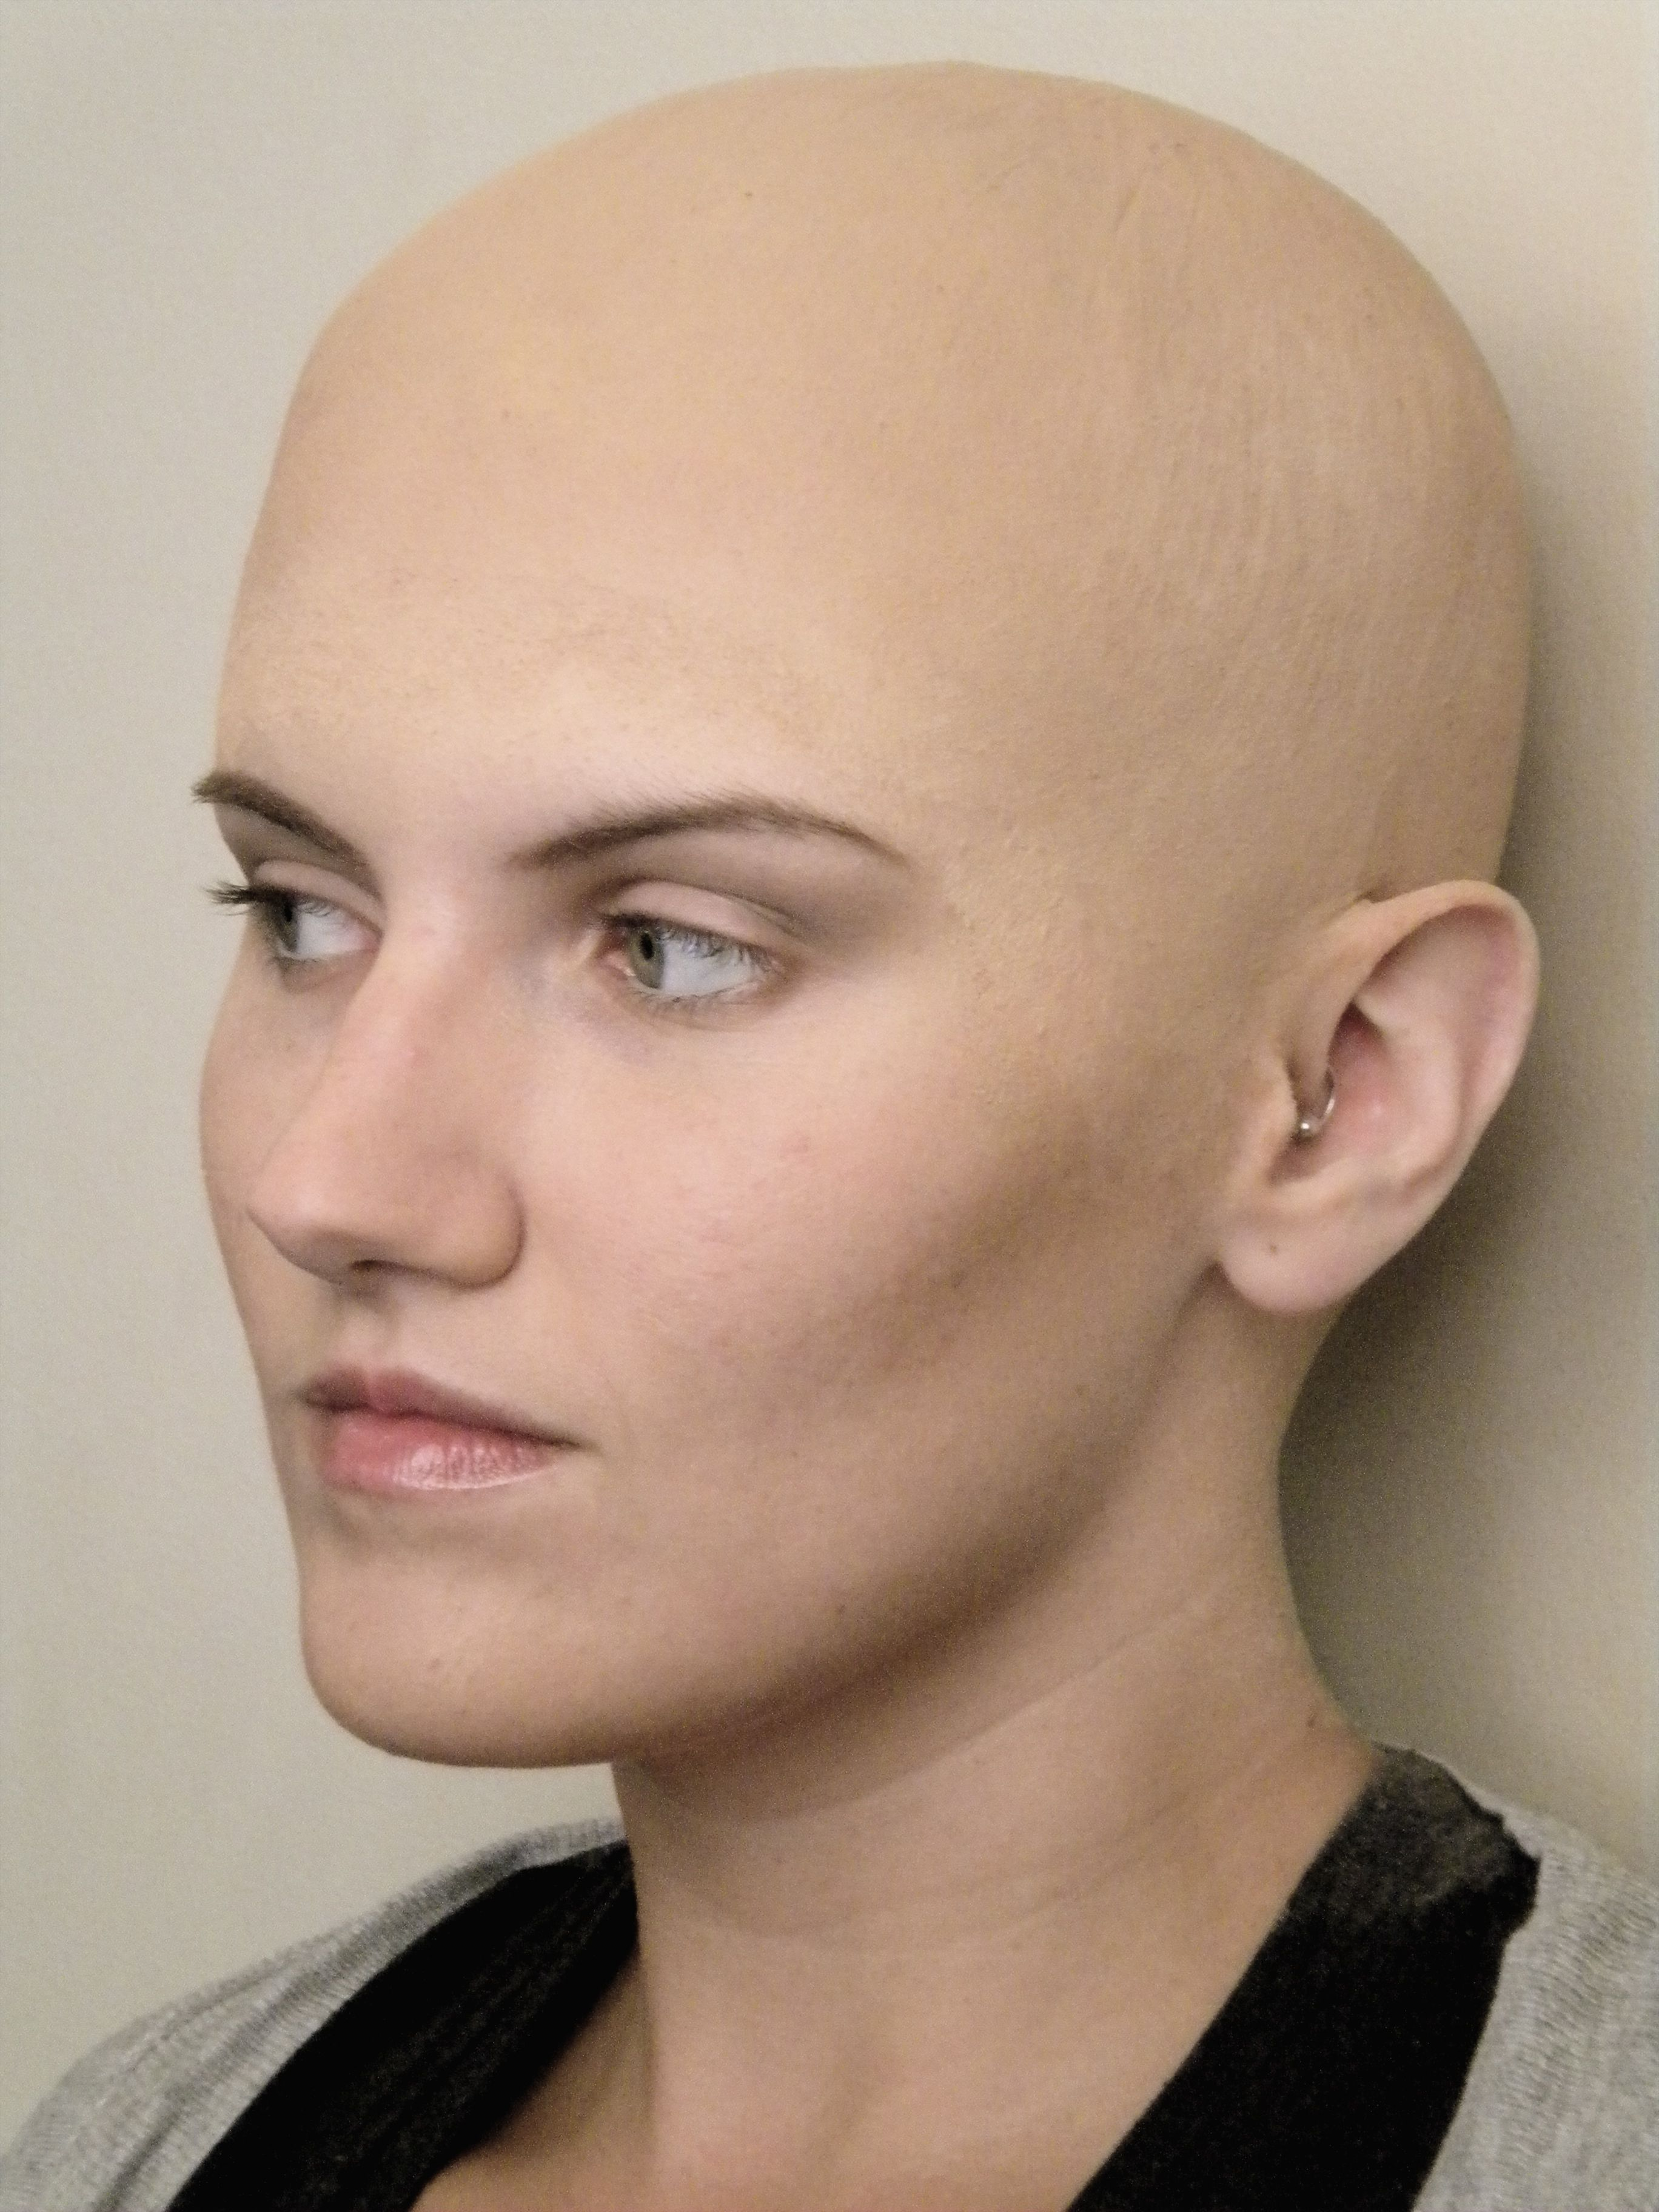 girl-bush-head-shaved-swinger-club